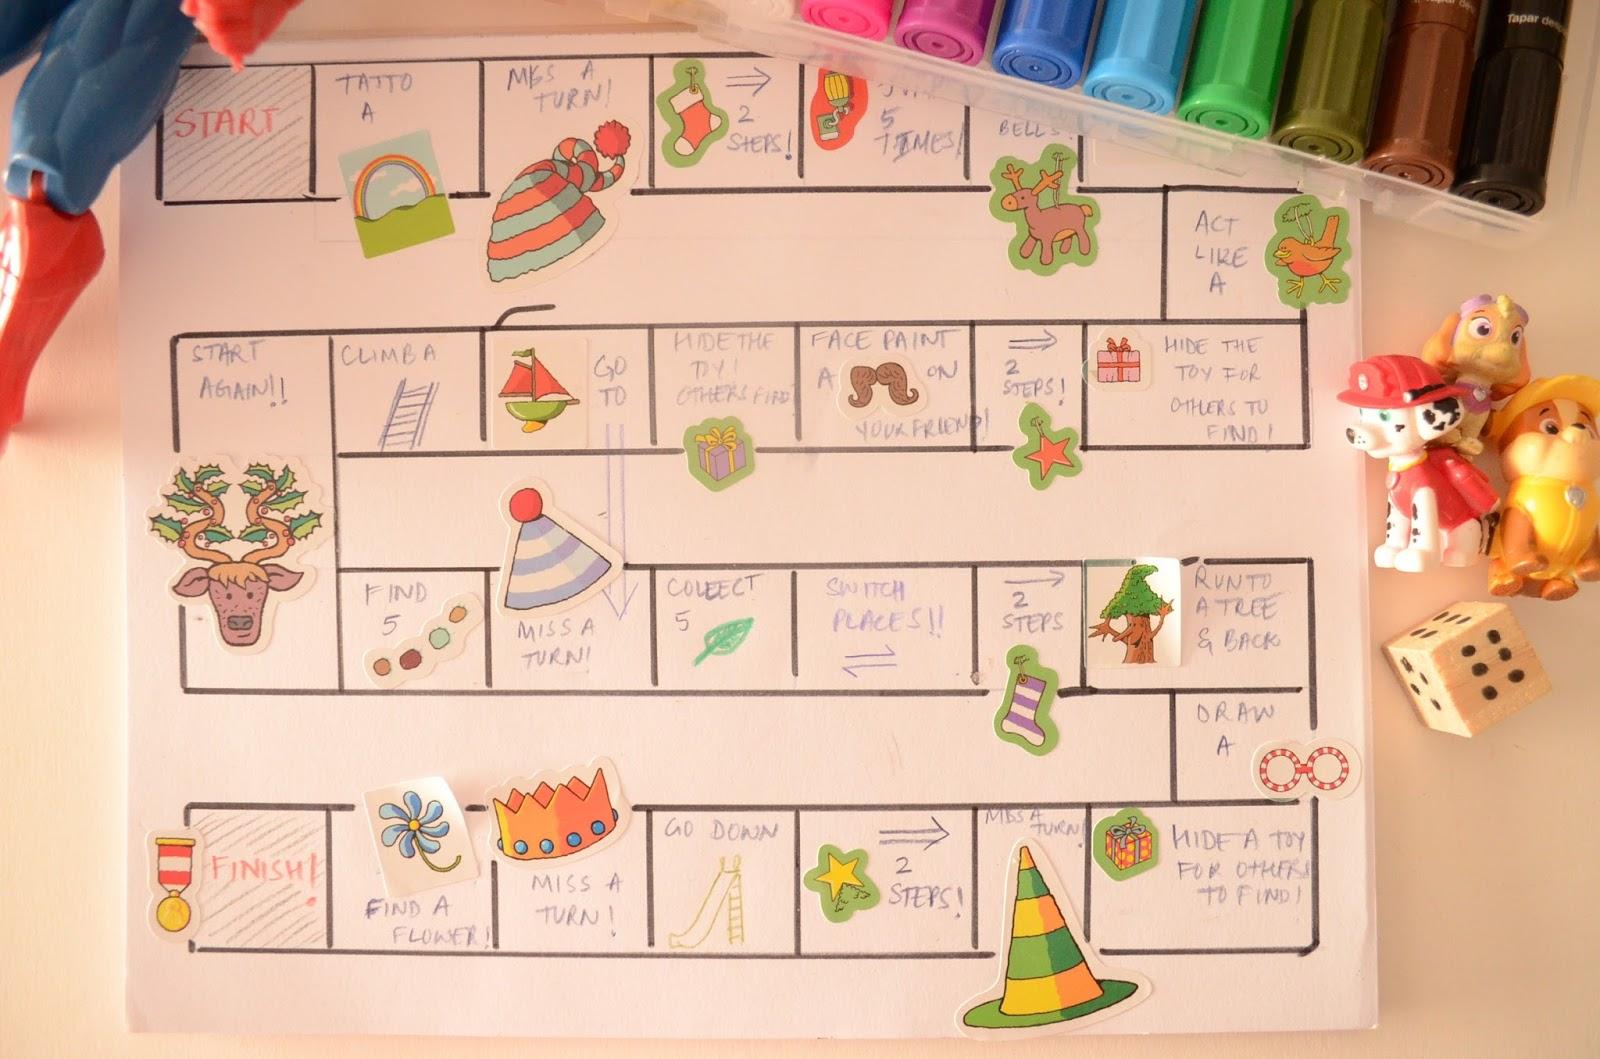 Practical Mom: 'Let's go Outside!' Board Game Printable!